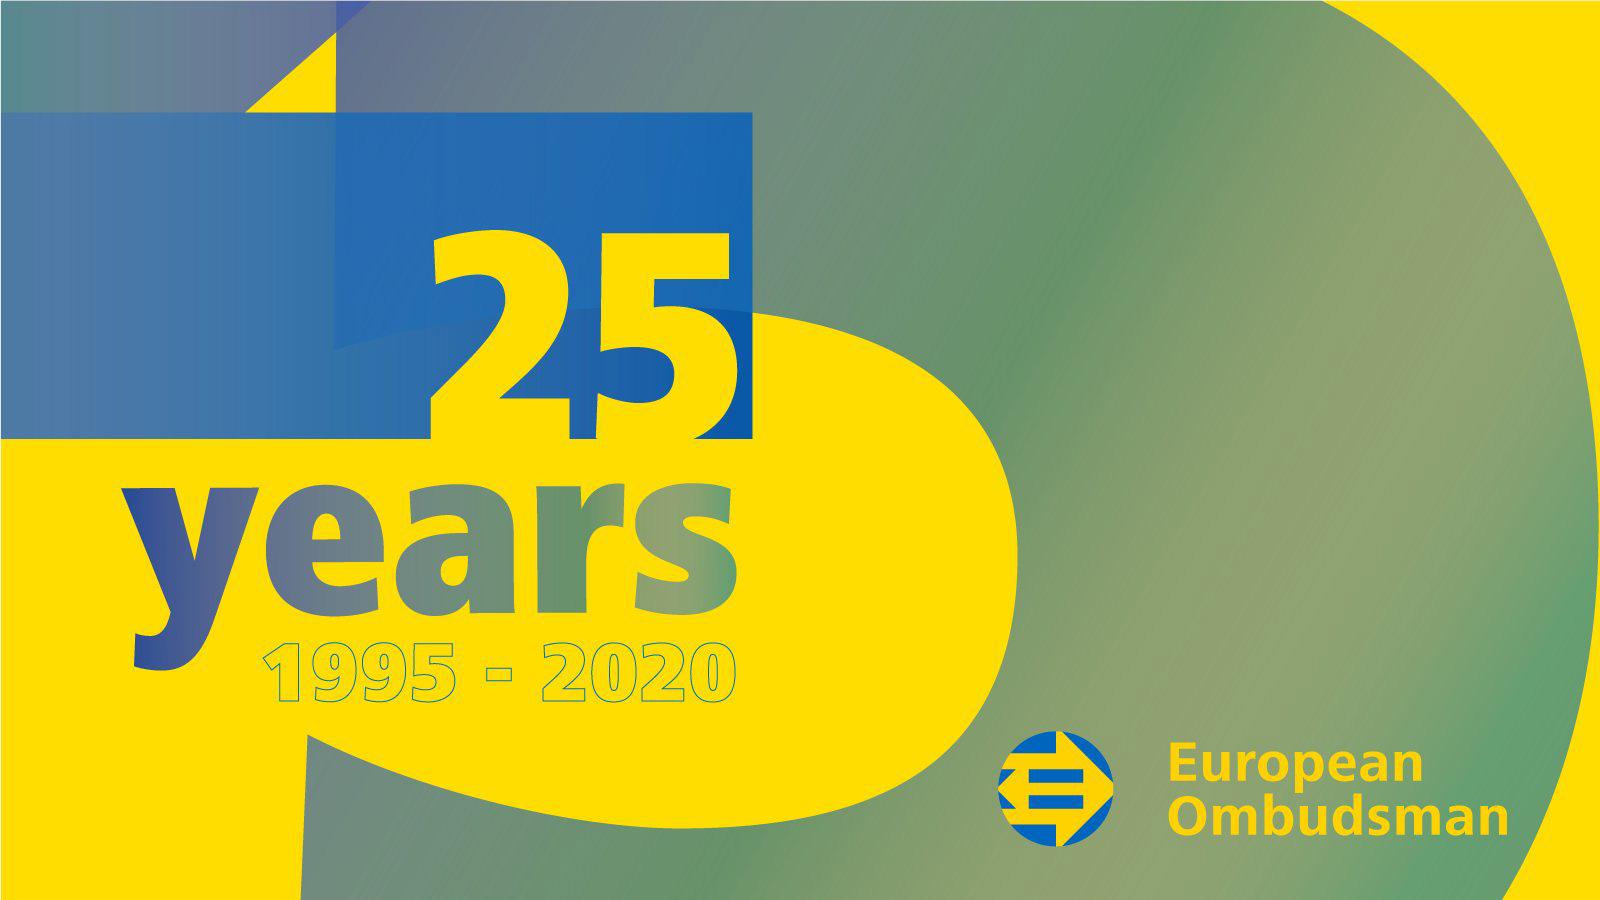 25-vuotisjuhlakonferenssi